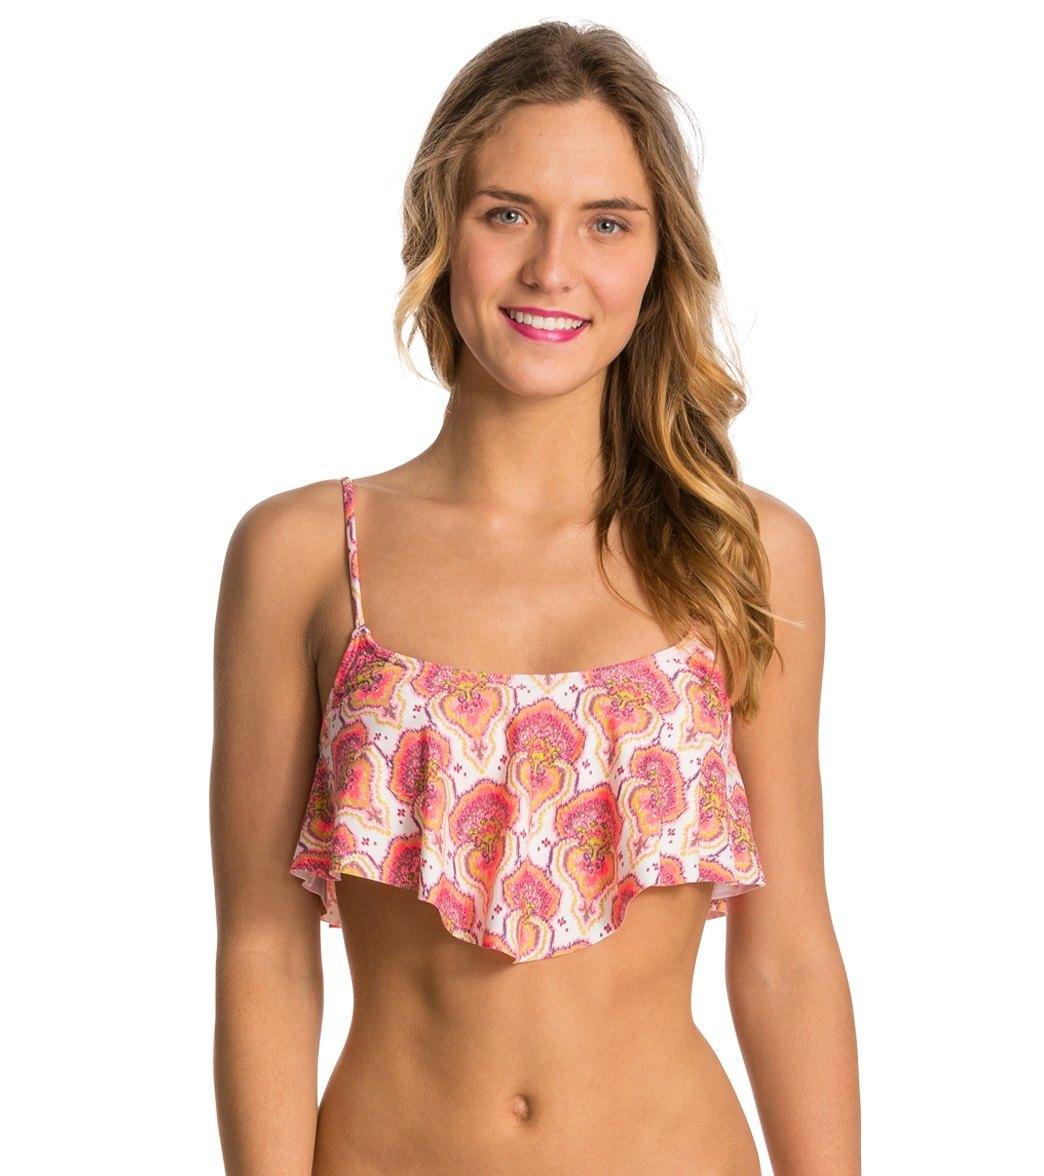 af924bbc03a14 ONeill Swimwear Vindaloo Tank Crop Bikini Top at SwimOutlet.com